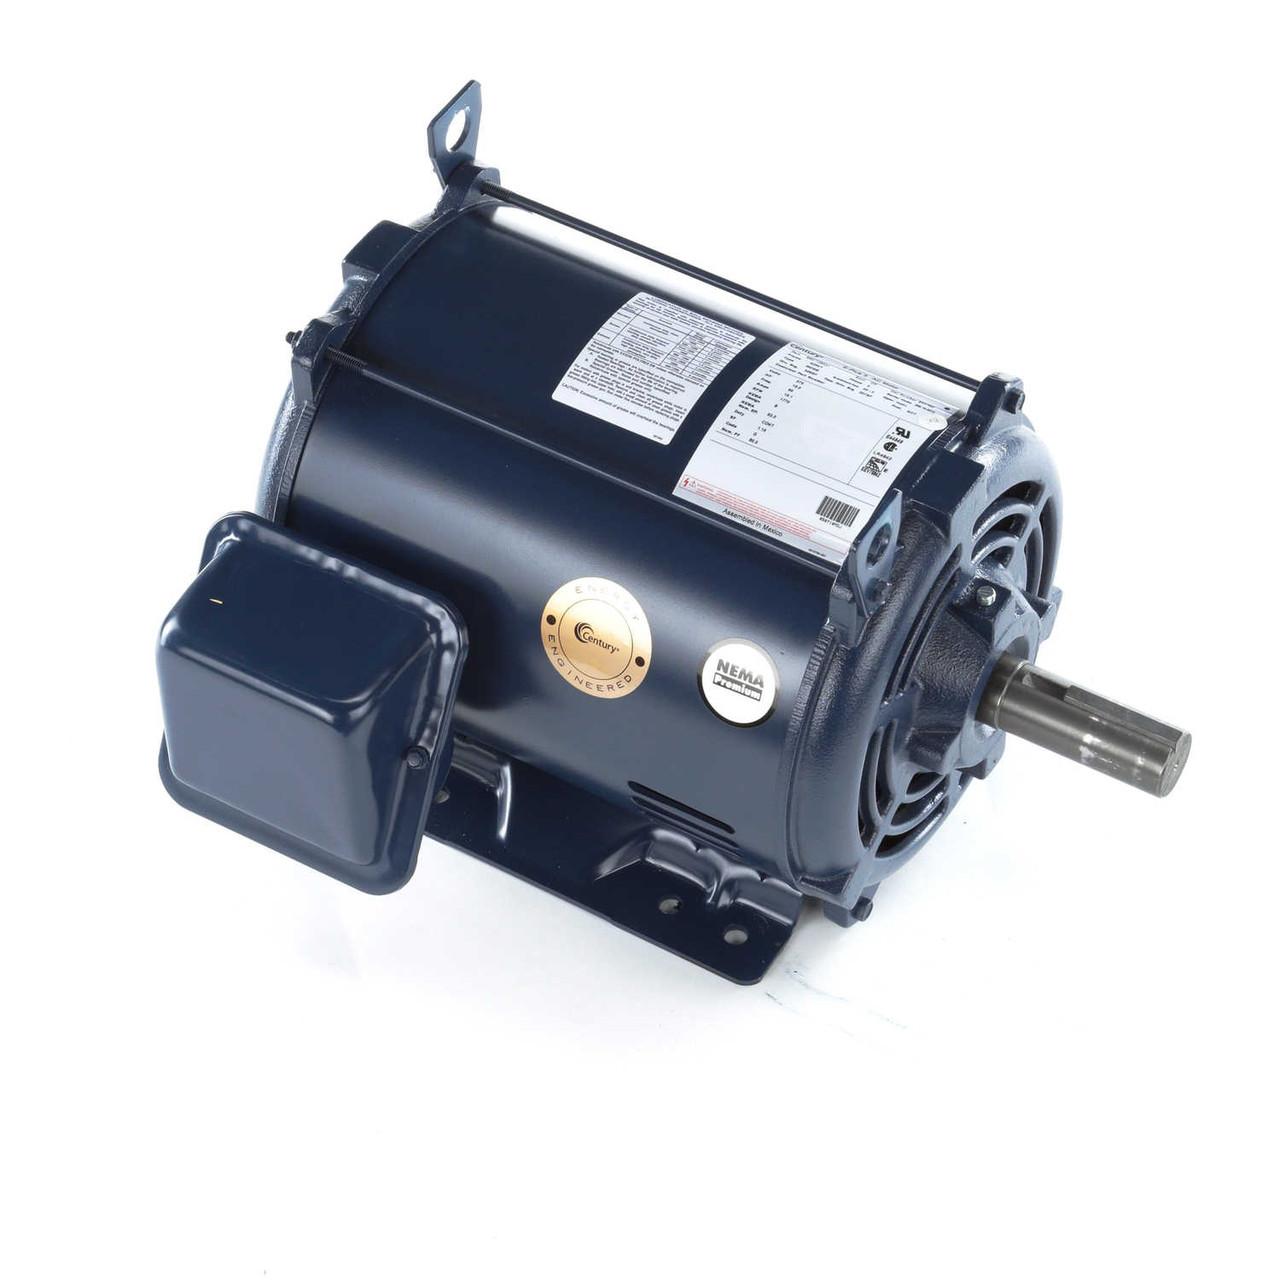 E927M2 General Purpose Three Phase Dripproof Motor 15 HP